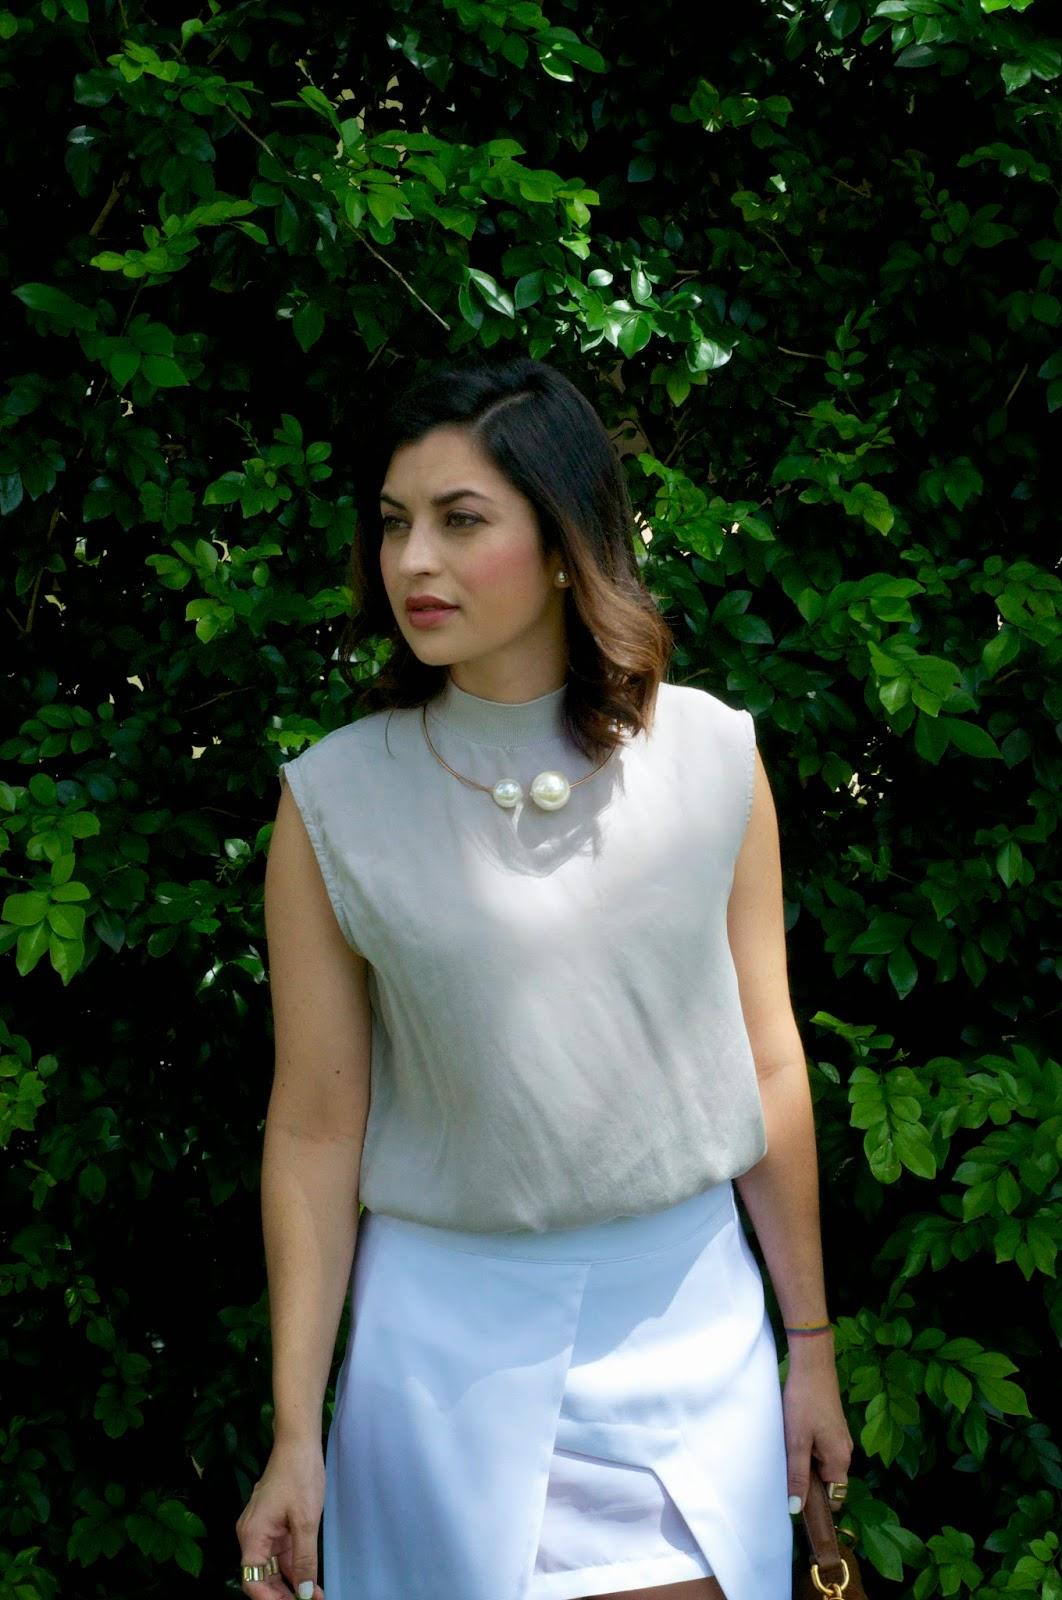 whiteedgyskirt